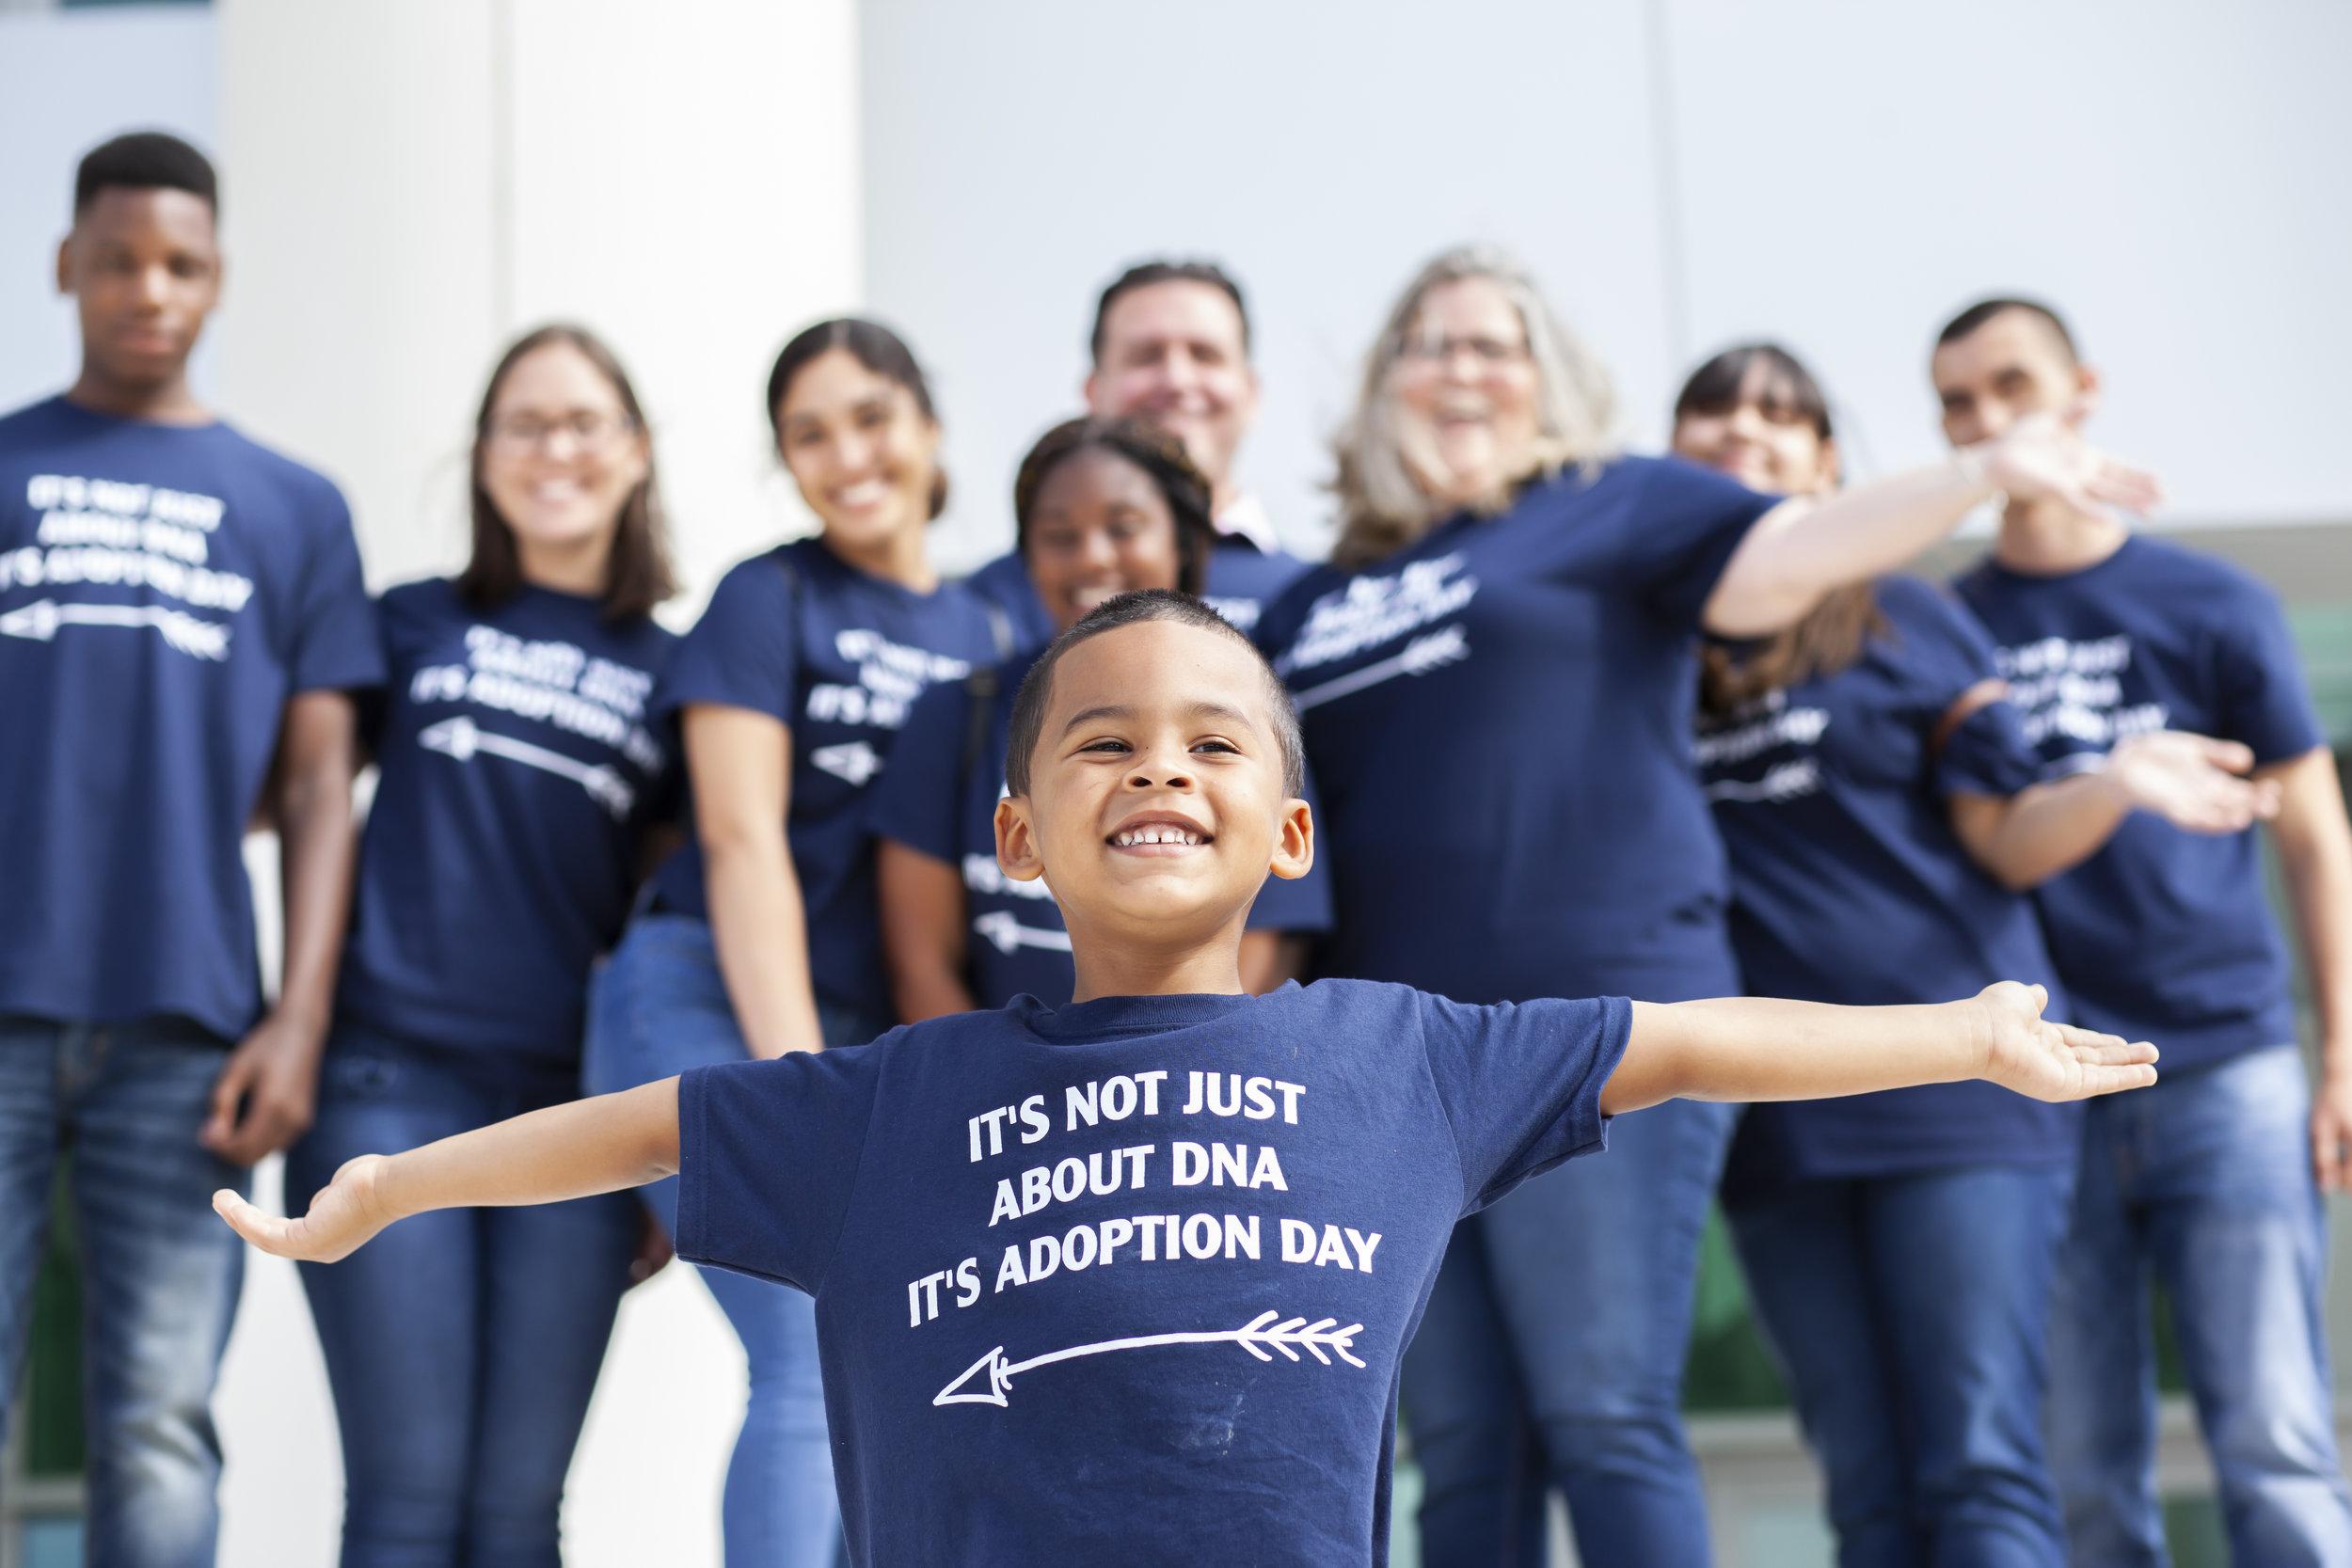 little-boy-happy-during-adoption-day-miami-winter-miami-childrens-courthouse